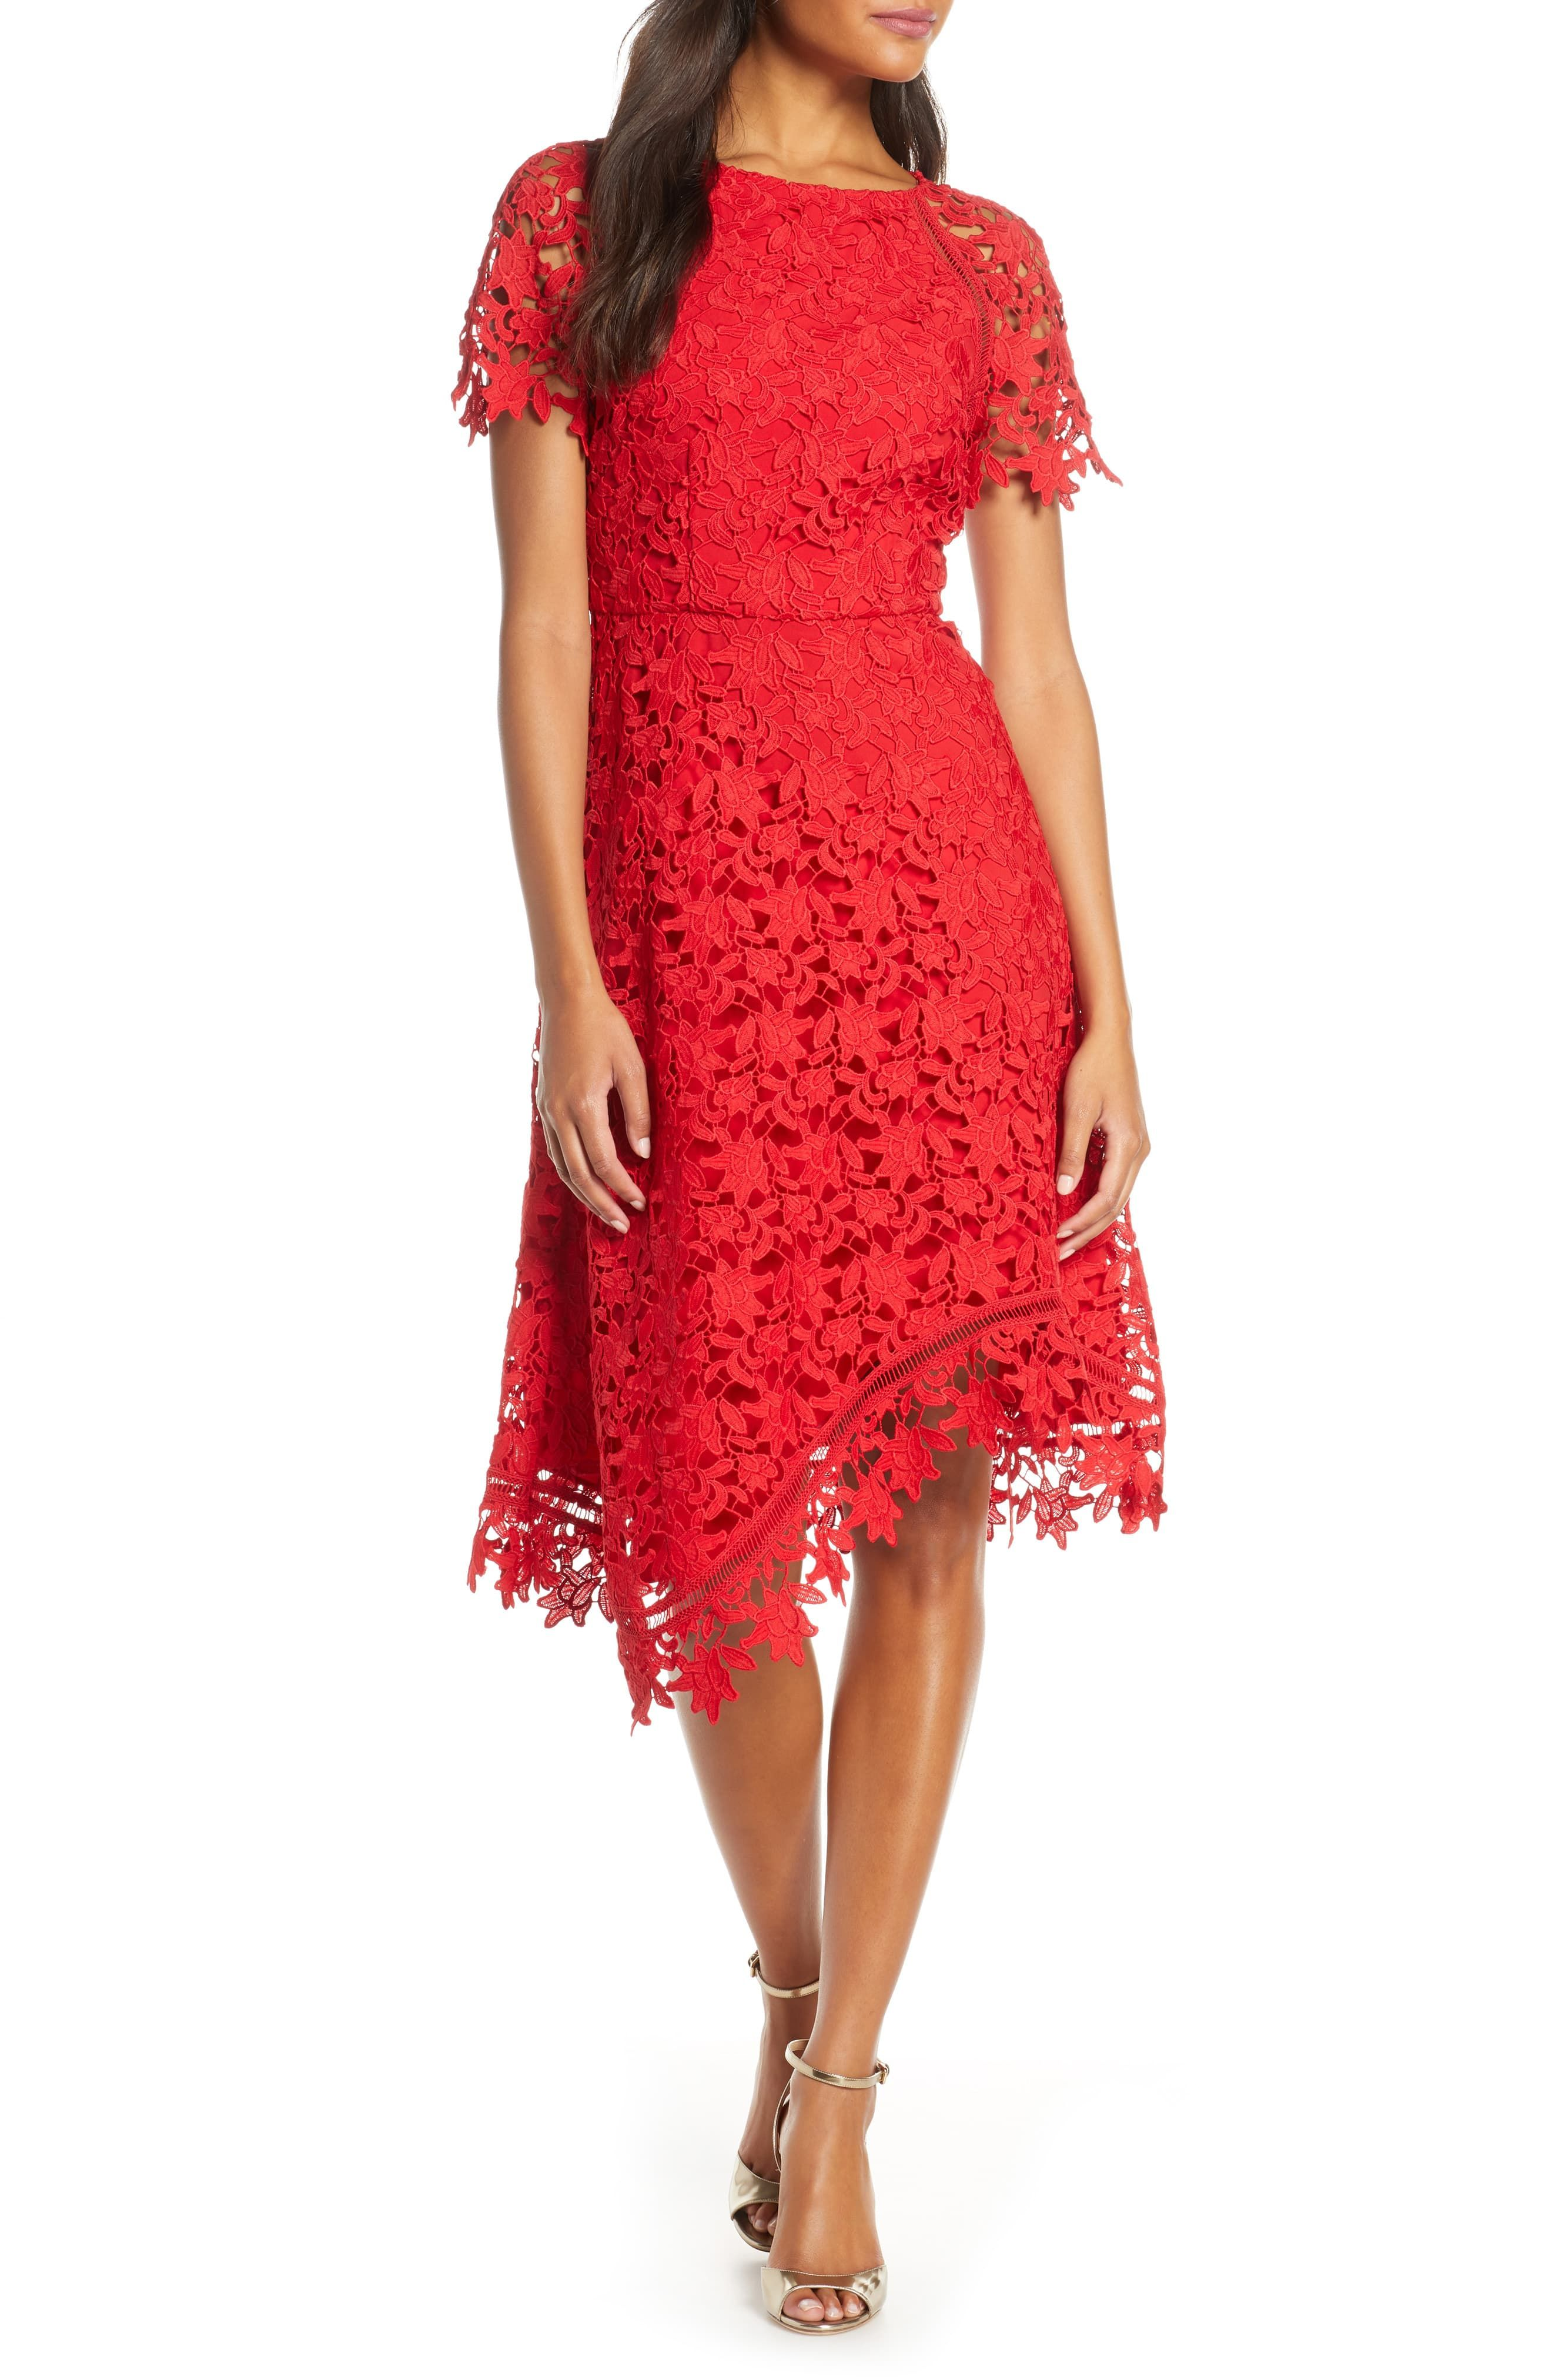 Eliza J Asymmetrical Lace Dress Nordstrom Red Lace Midi Dress Lace Dress Striped Knit Dress [ 4048 x 2640 Pixel ]